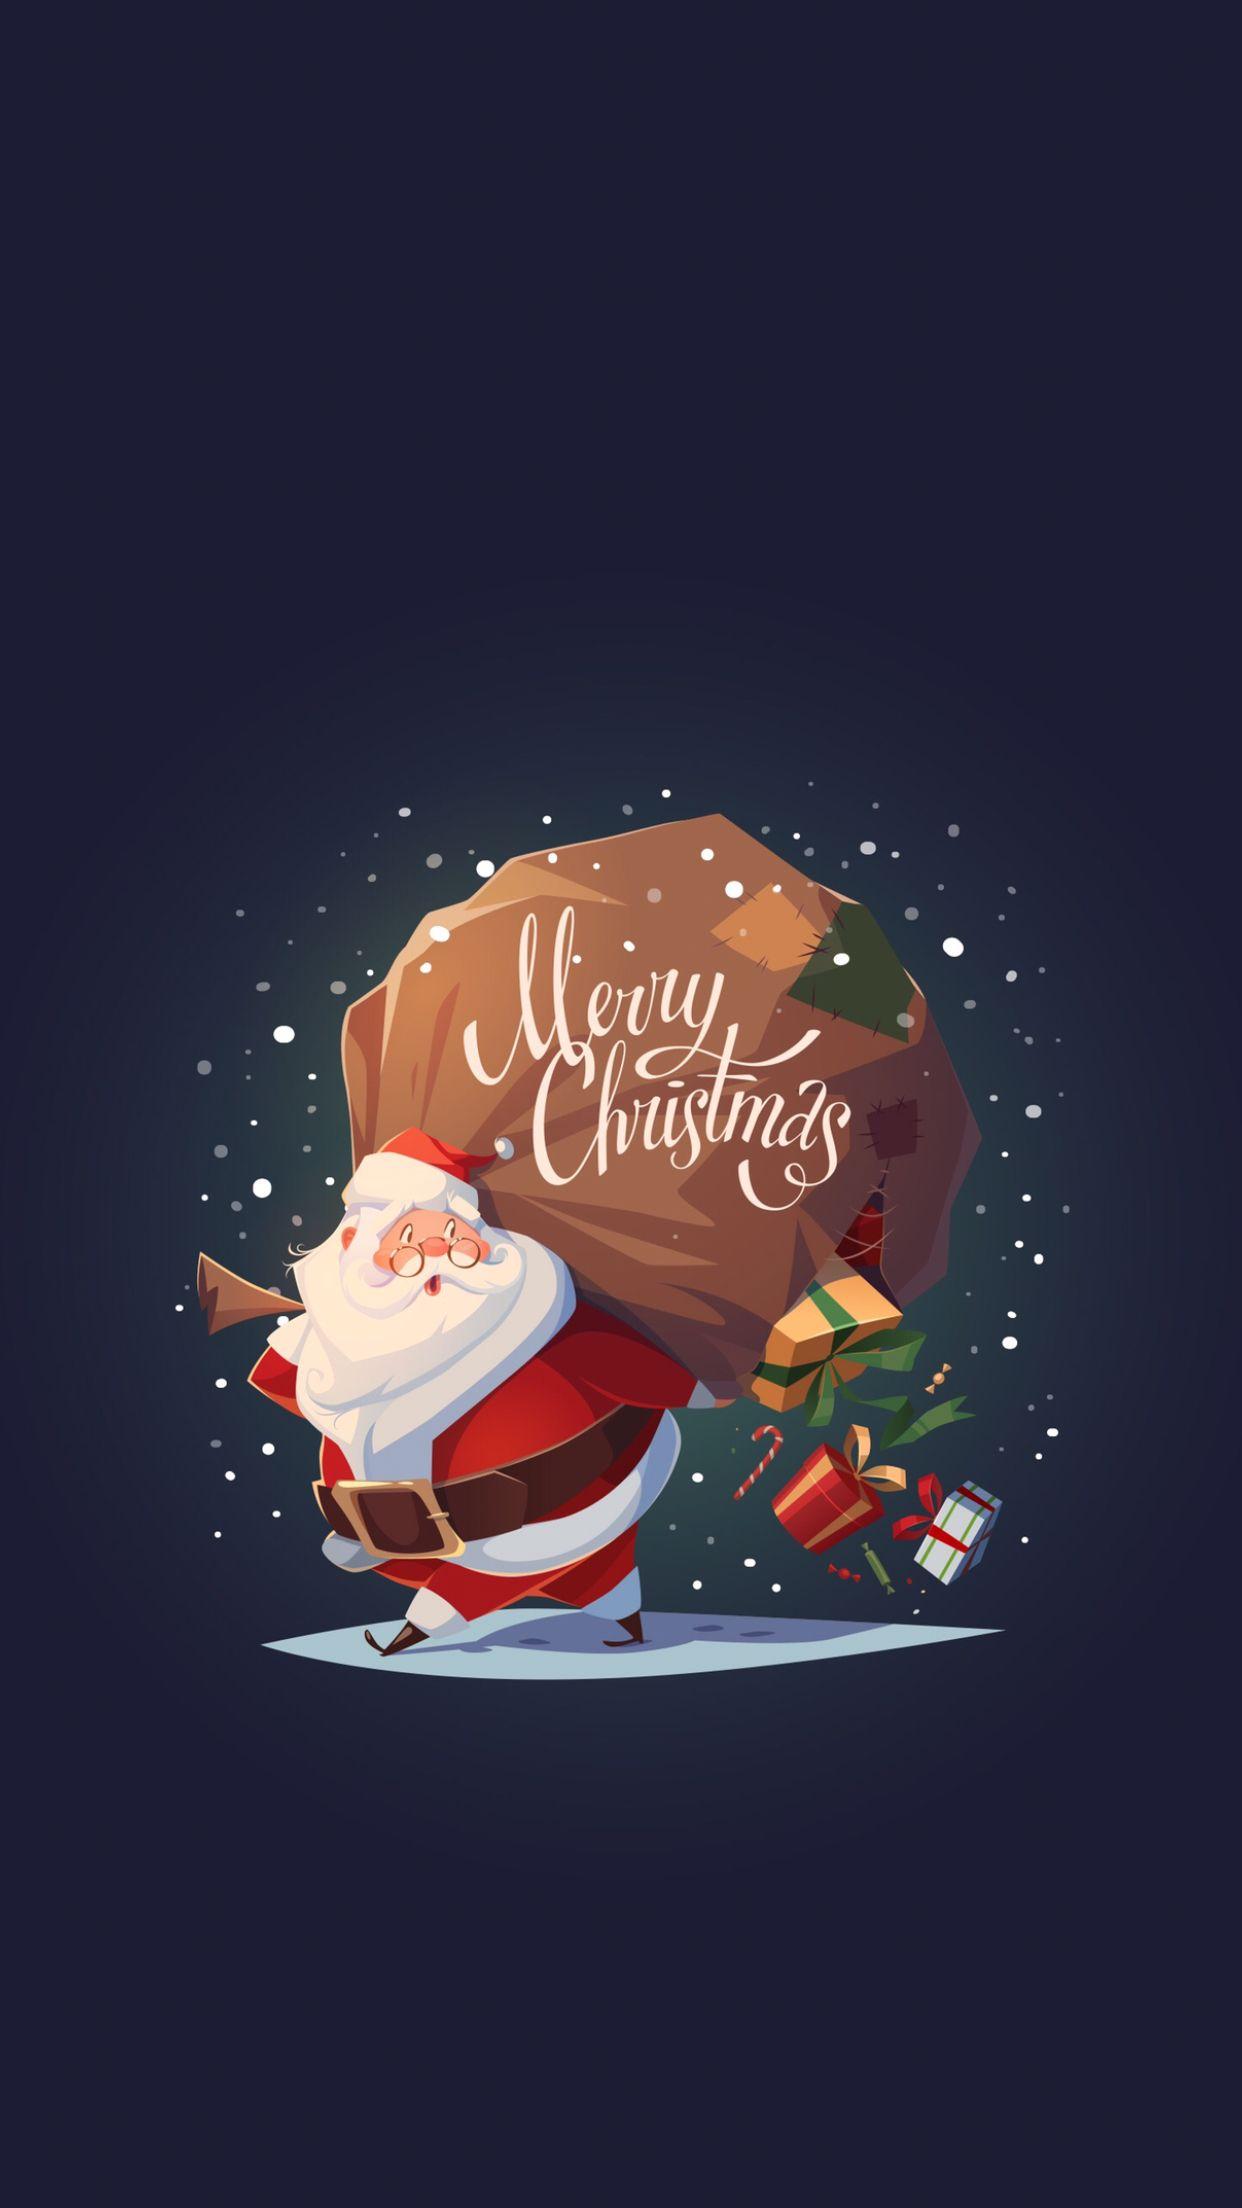 Dhejdhdbdjfbb Merry Christmas Wallpaper Cute Christmas Wallpaper Wallpaper Iphone Christmas